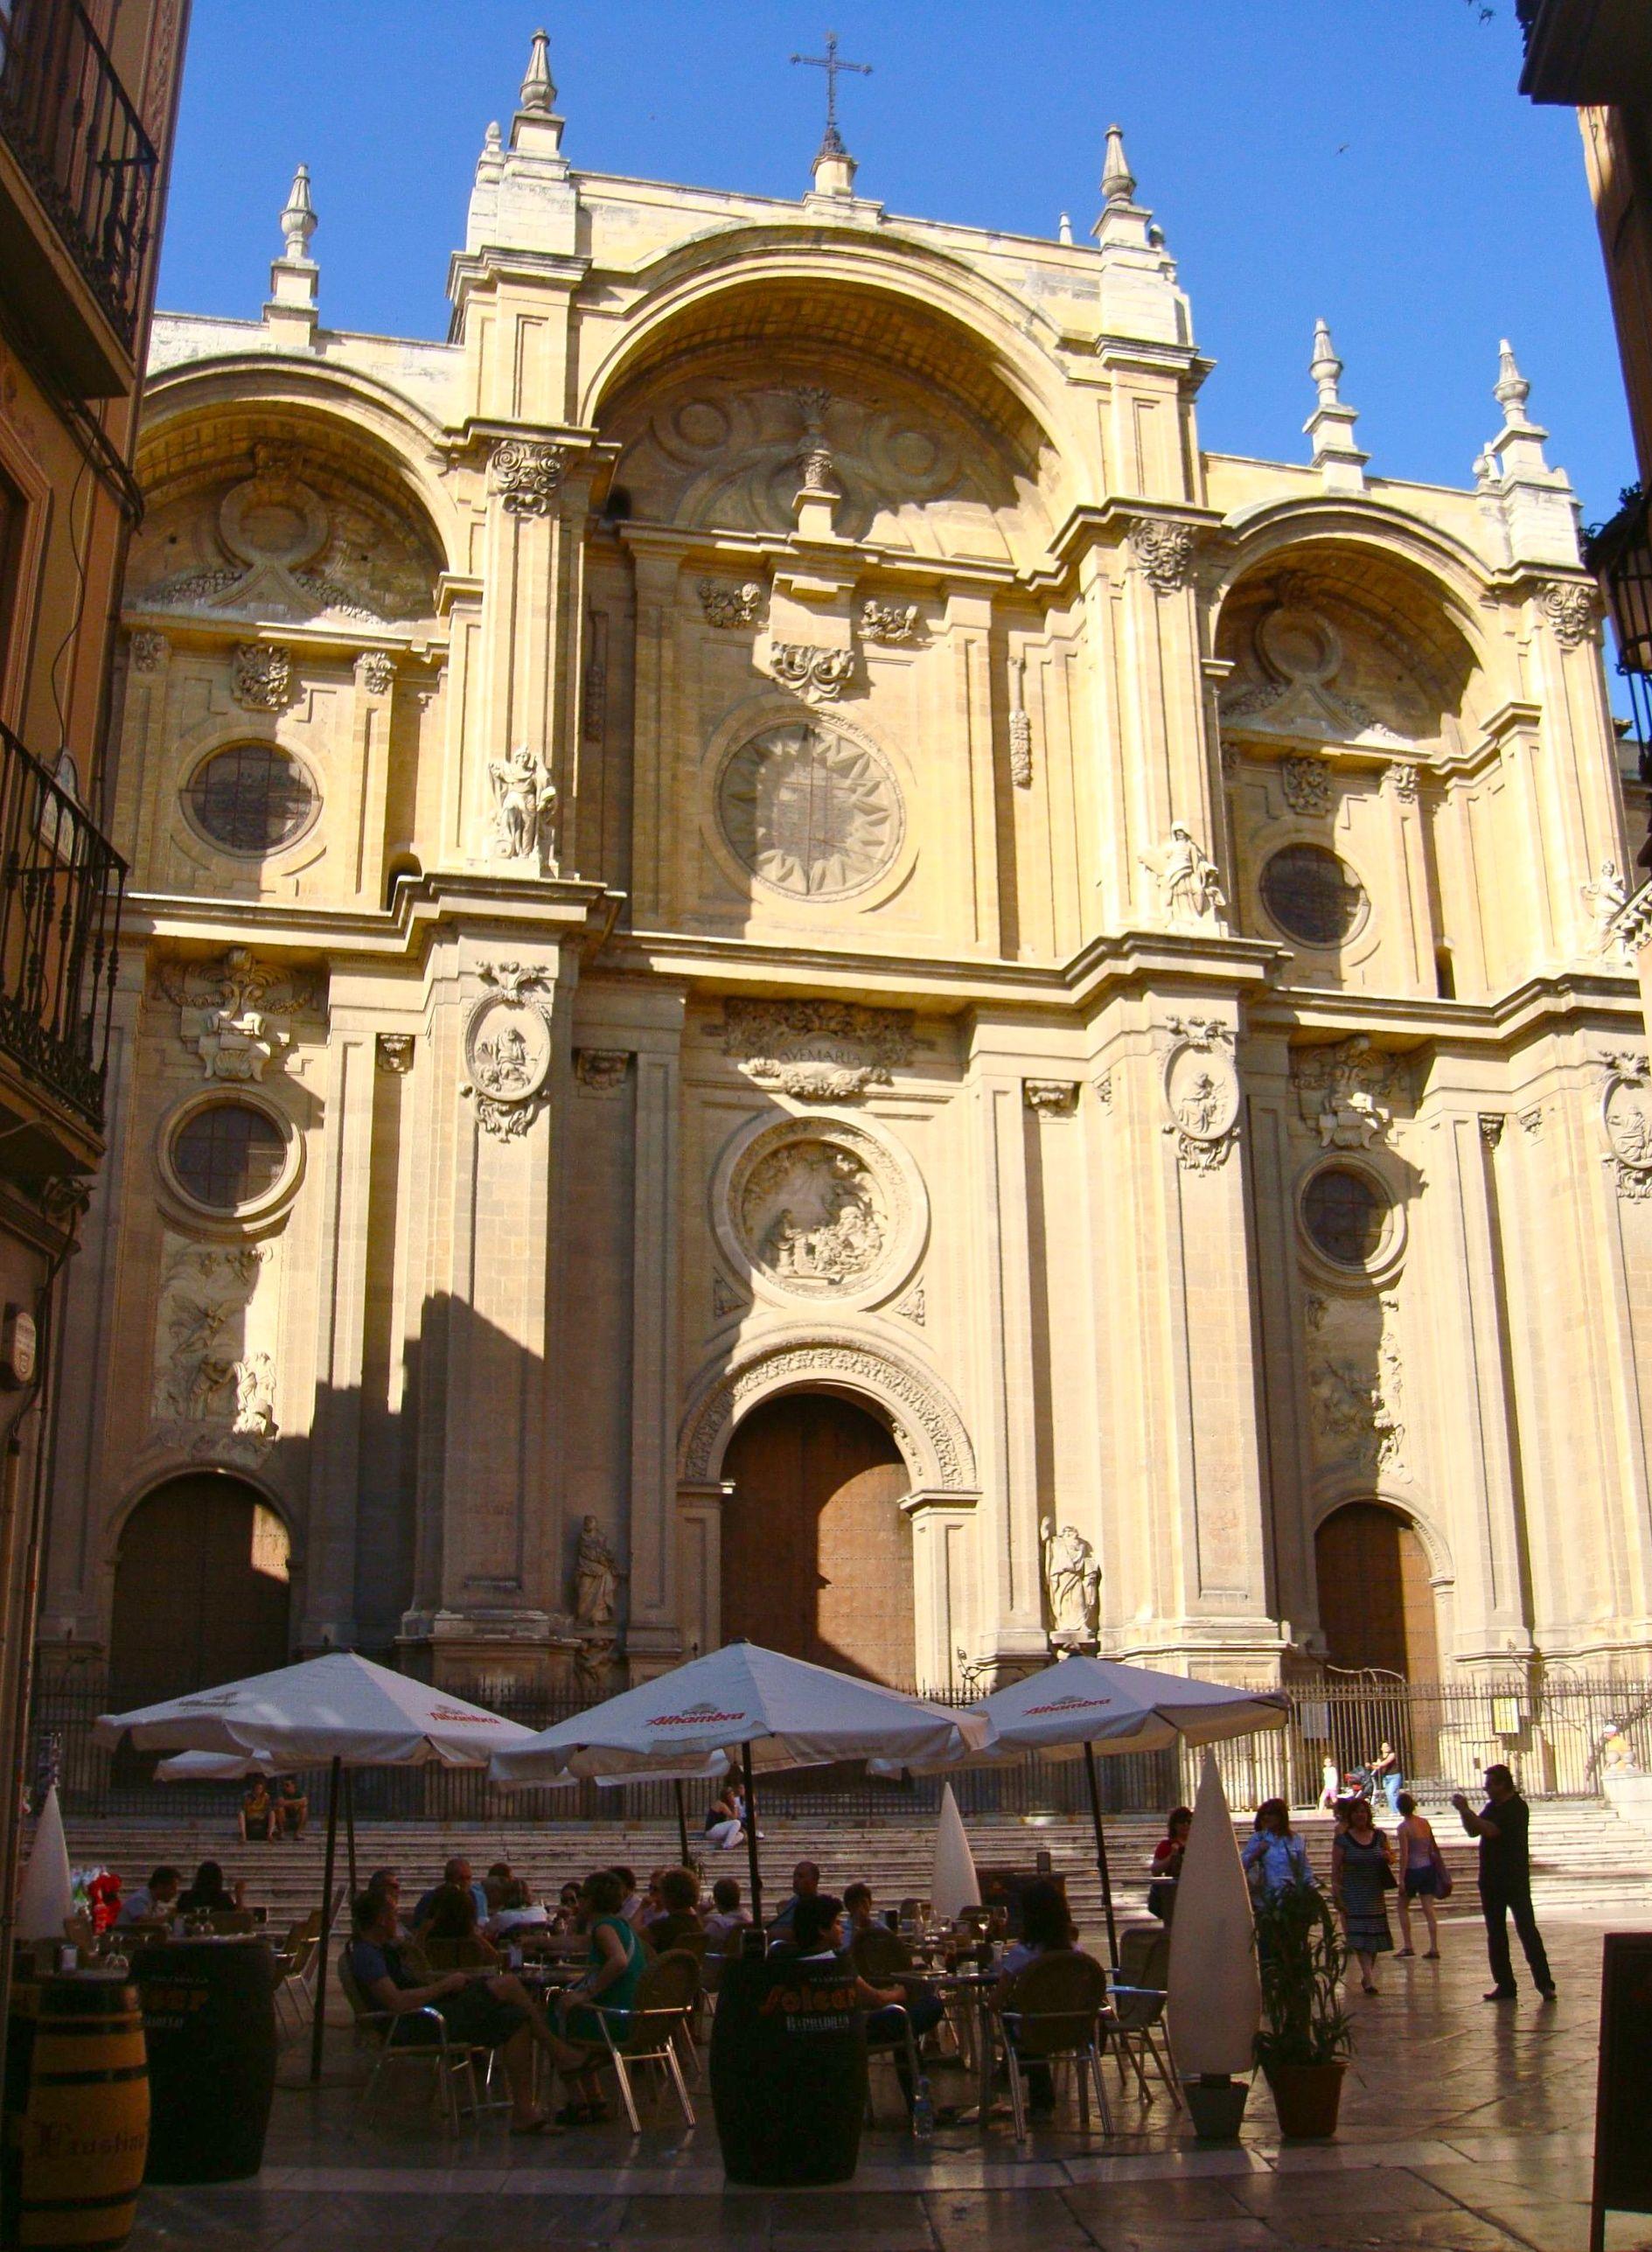 Fachada barroca de Alonso Cano - Catedral de Granada - ESPAÑA